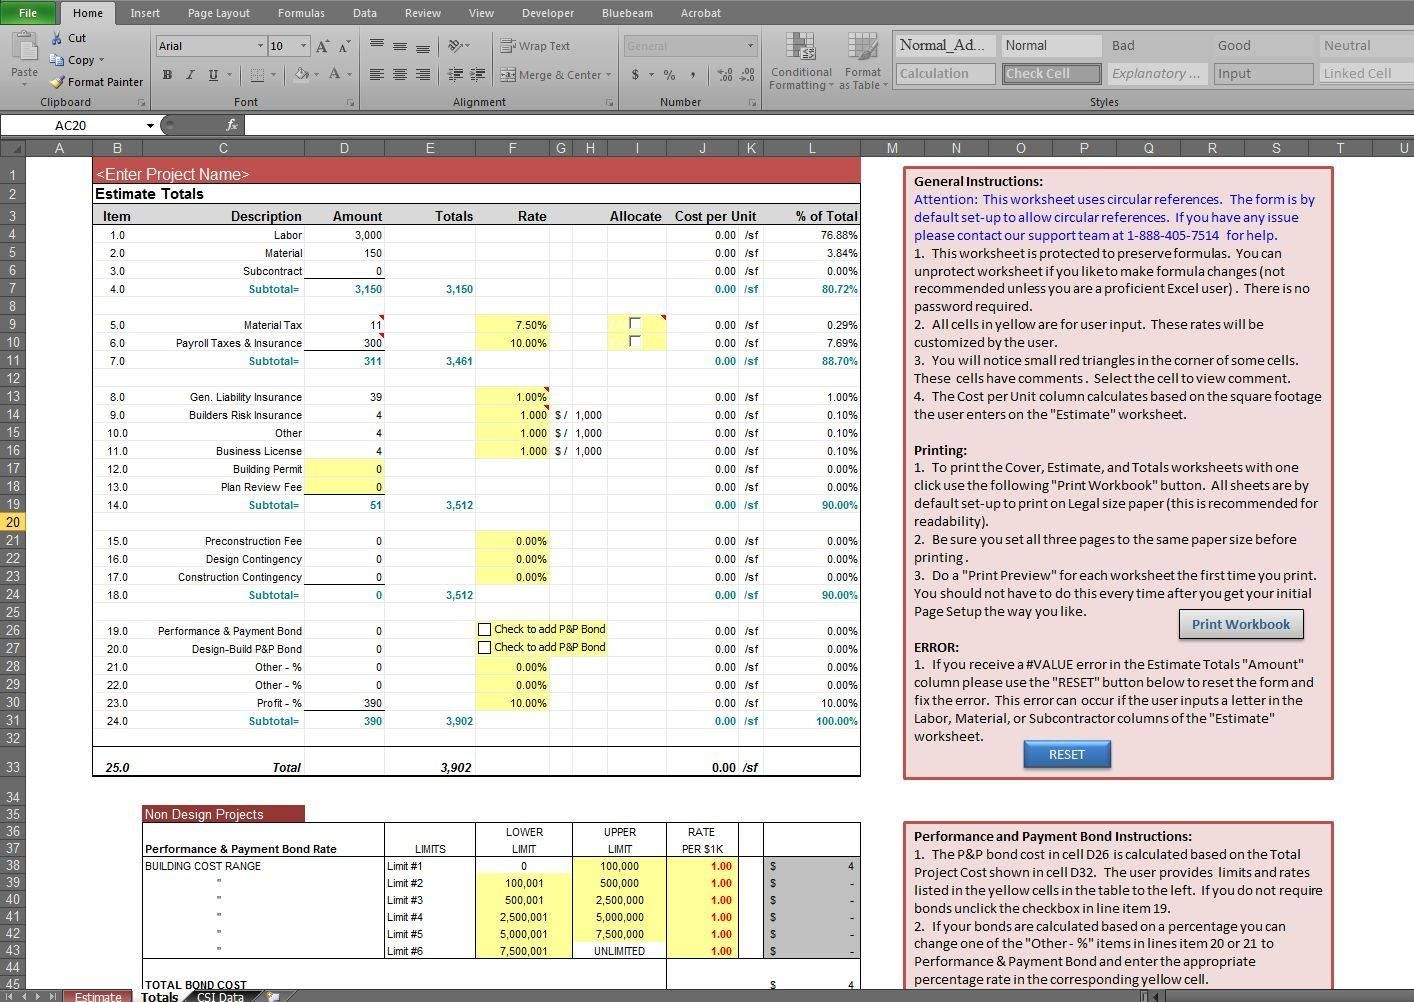 Building Construction Estimate Spreadsheet Excel Download Estimate Template Spreadsheet Template Construction Quotes Construction cost estimate template excel